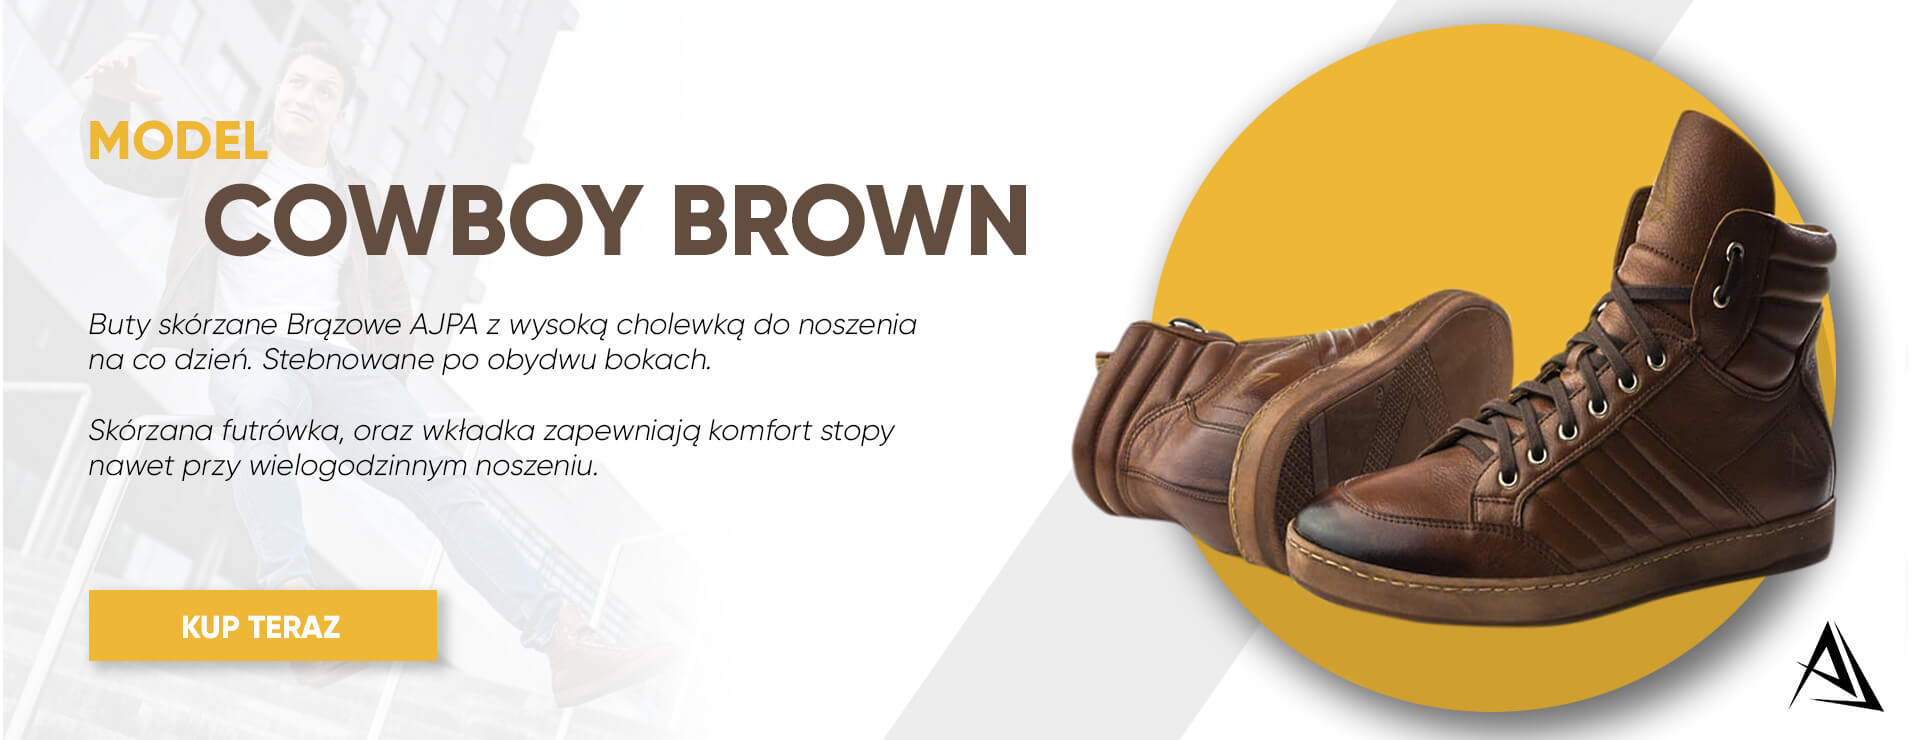 baner buty cowboy brown ajpa